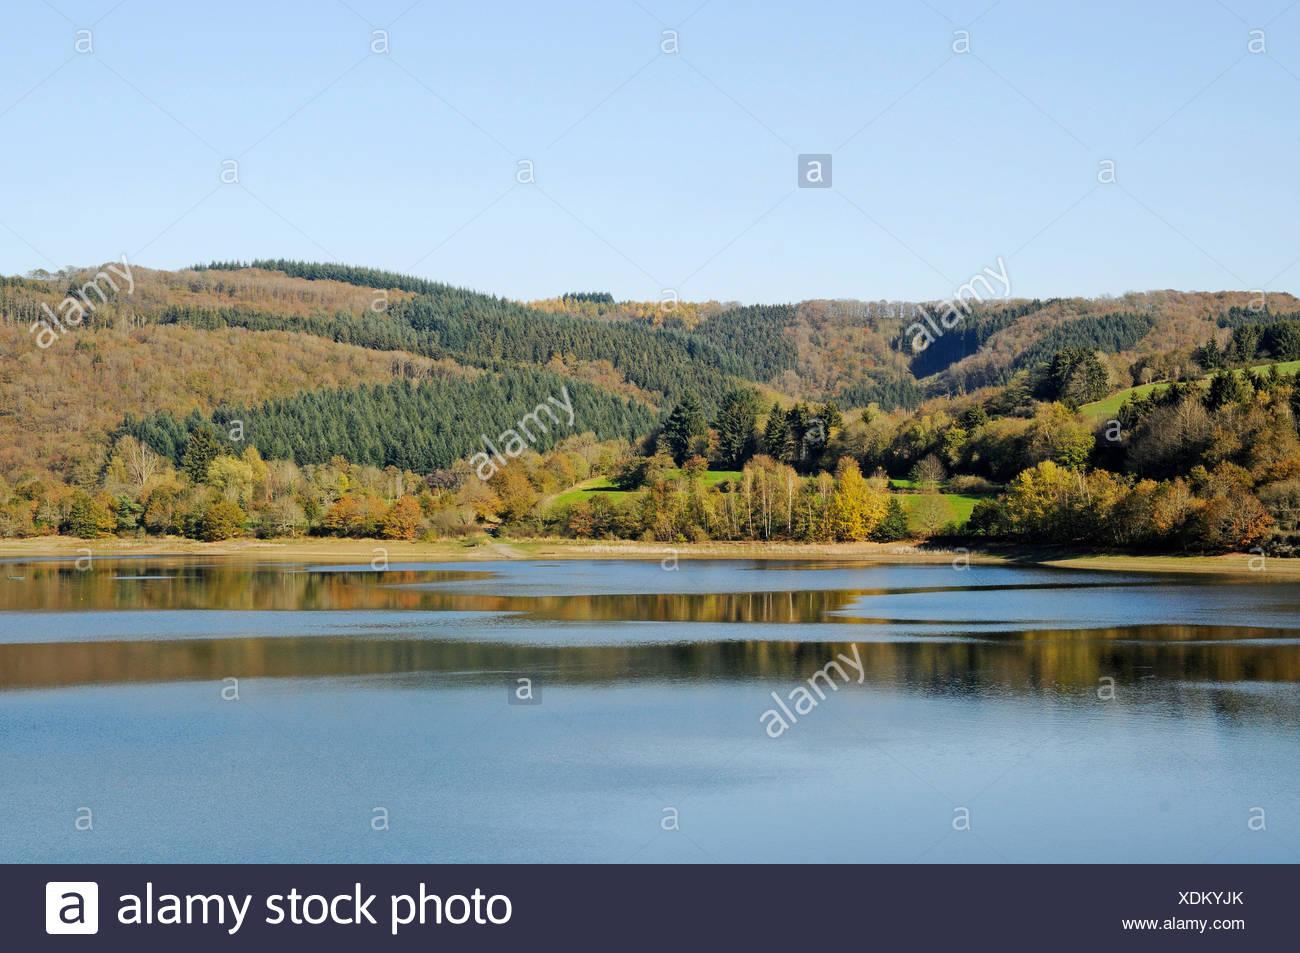 Oberauer Reservoir, Esch sur Sûre, Sauer or Sûre River, Upper Sûre National Park, Luxembourg, Europe, PublicGround - Stock Image